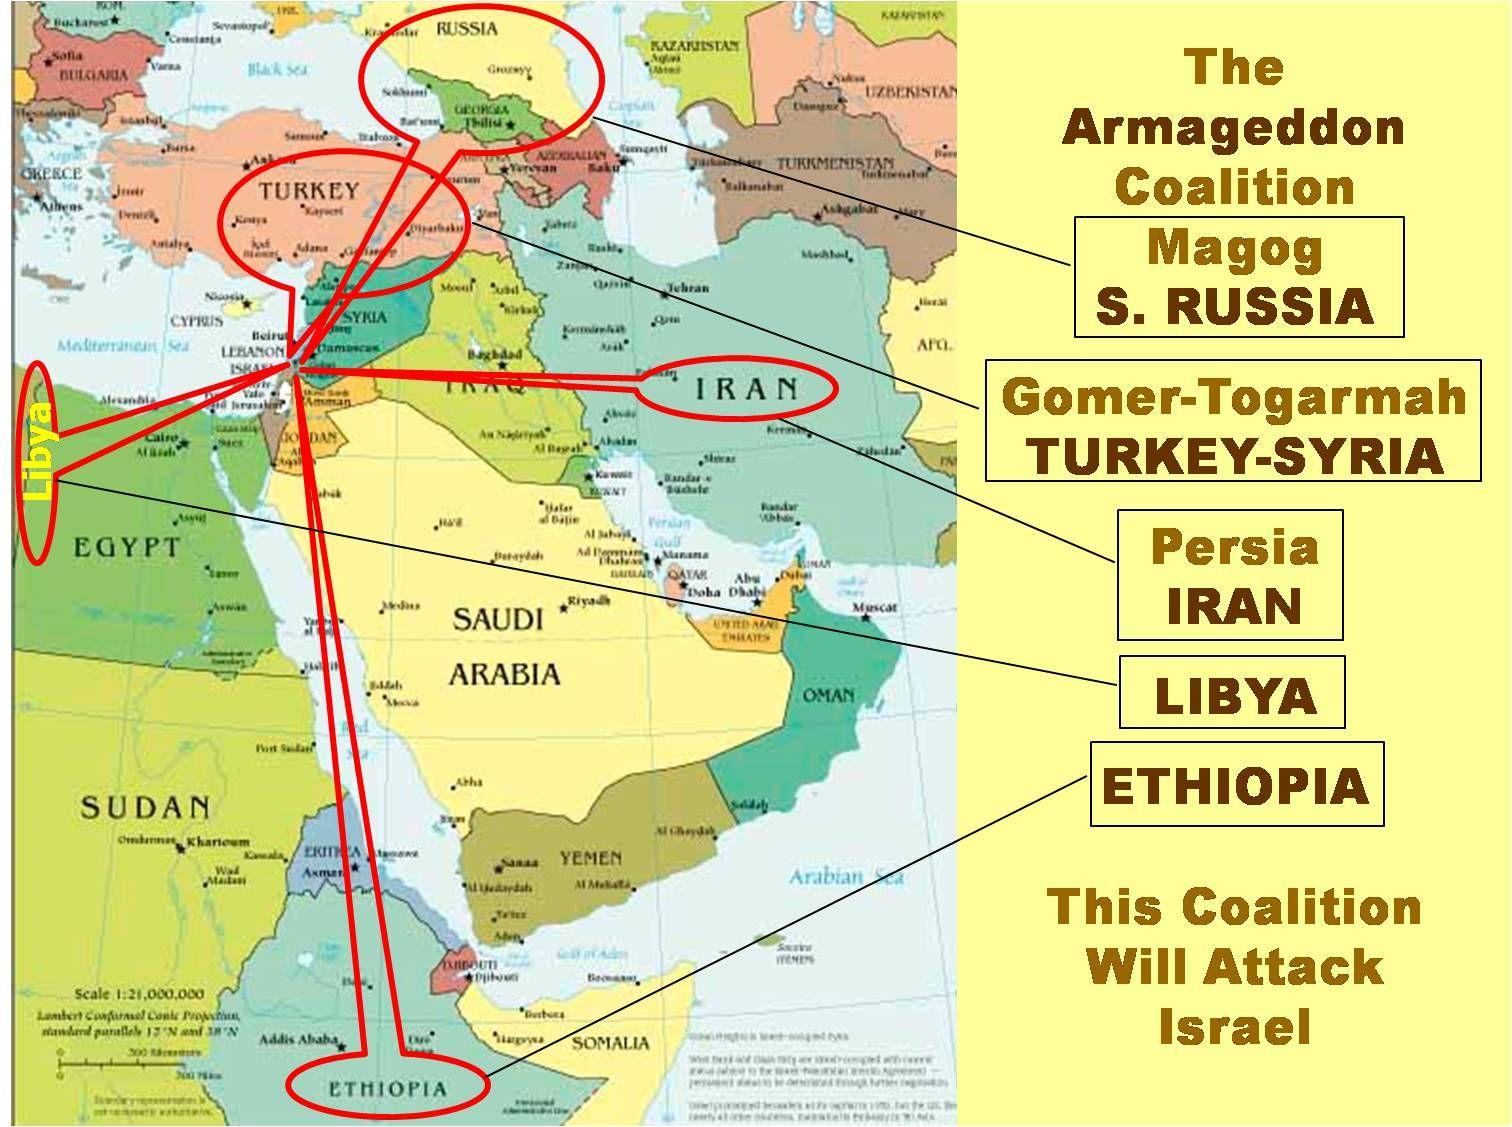 BATTLE OF ARMAGEDDON So Iran Ethiopia Libya And Turkey Will - Where is libya